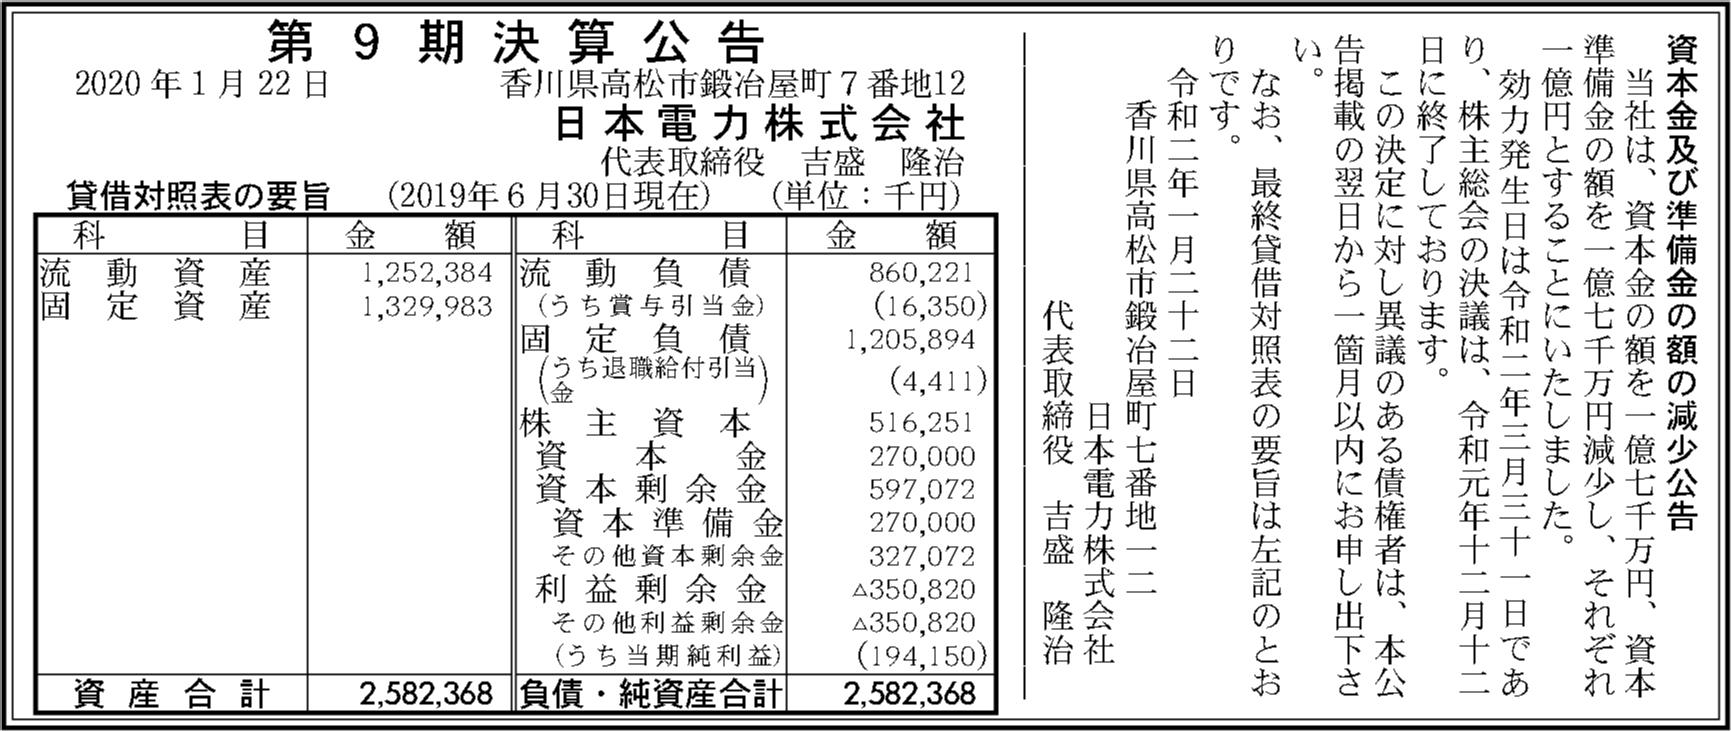 0060 cc3bcca451b536c0e3b91da8b848f34339cc56dc79eb6d2687e98f13e875abe6903c790ad715fe3213d4a21241f3bf8236697b658462b9efc246fd12402f1b18 07